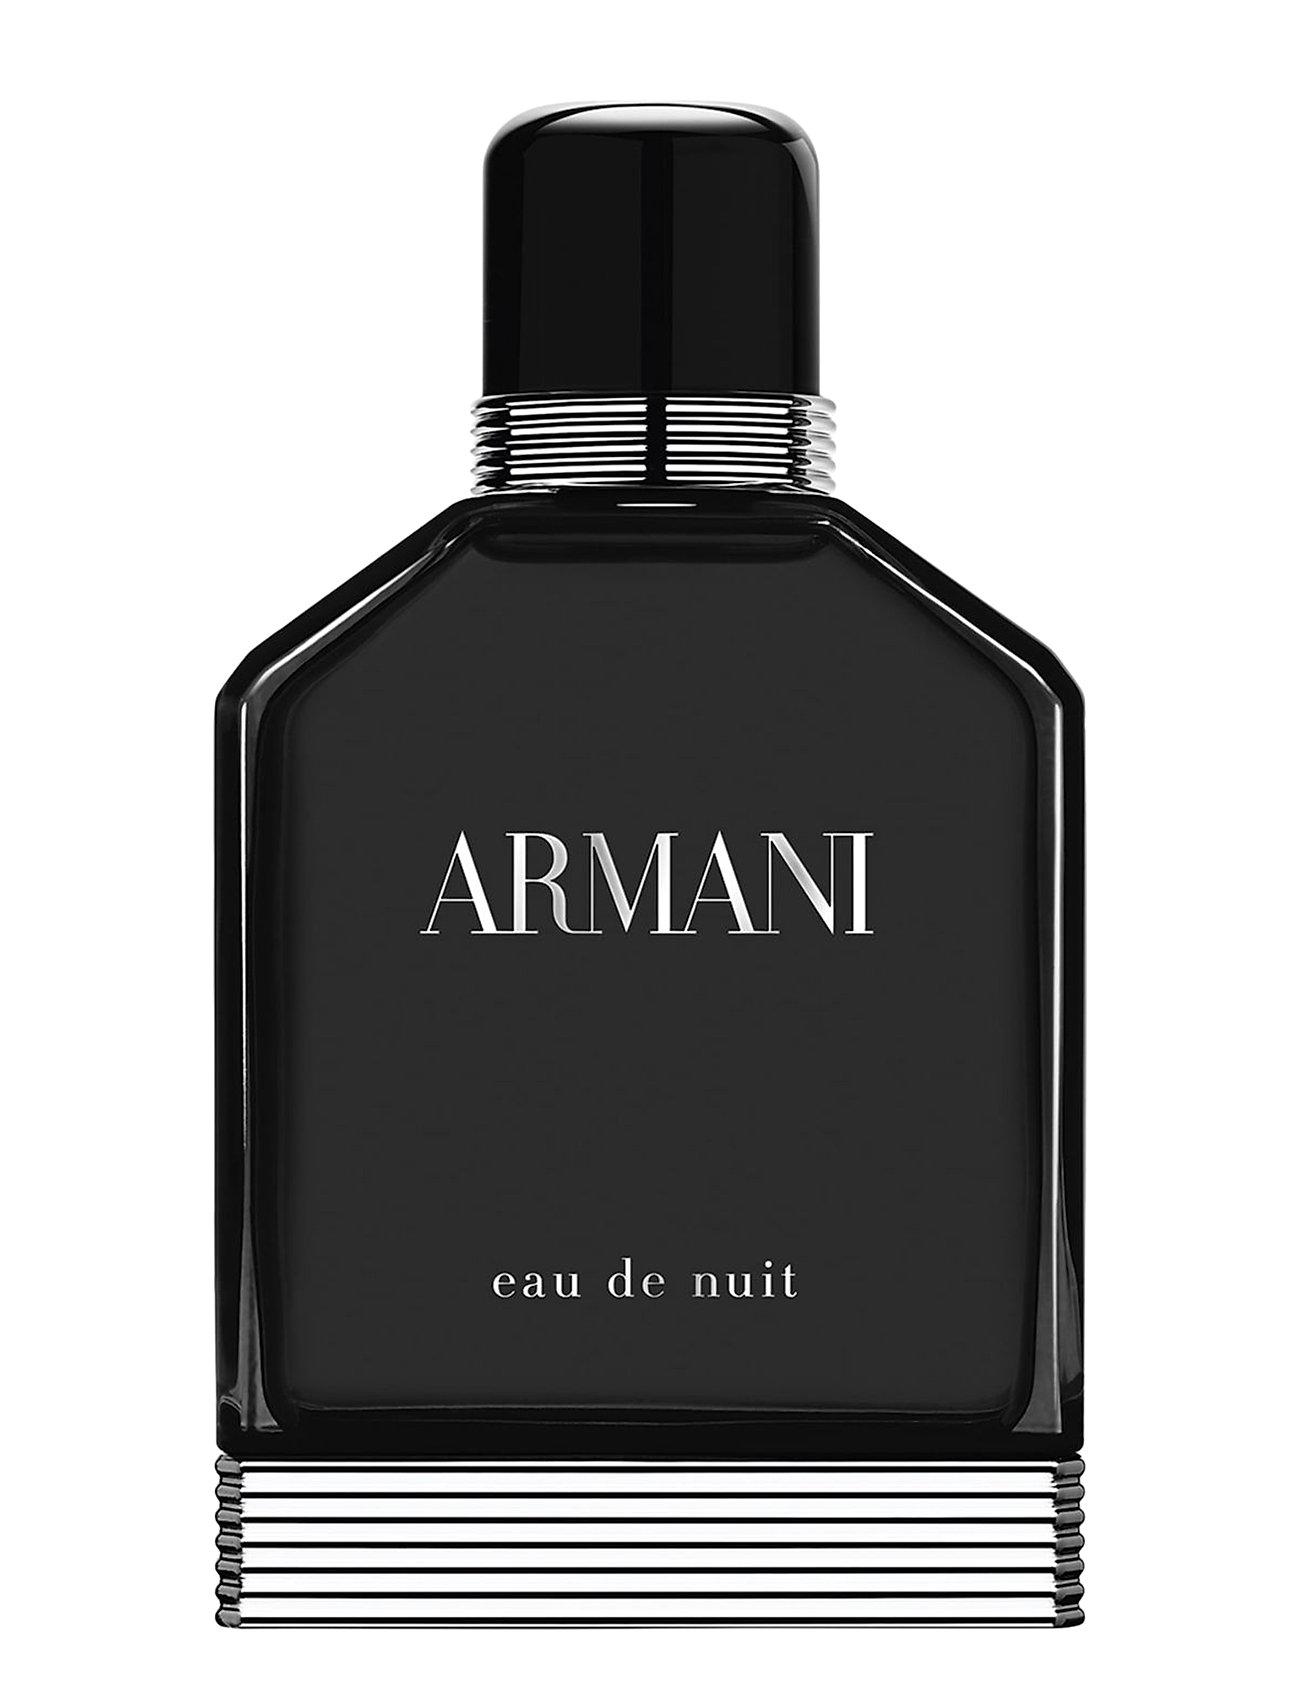 giorgio armani – Armani eau de nuit eau de toilette 100 ml fra boozt.com dk